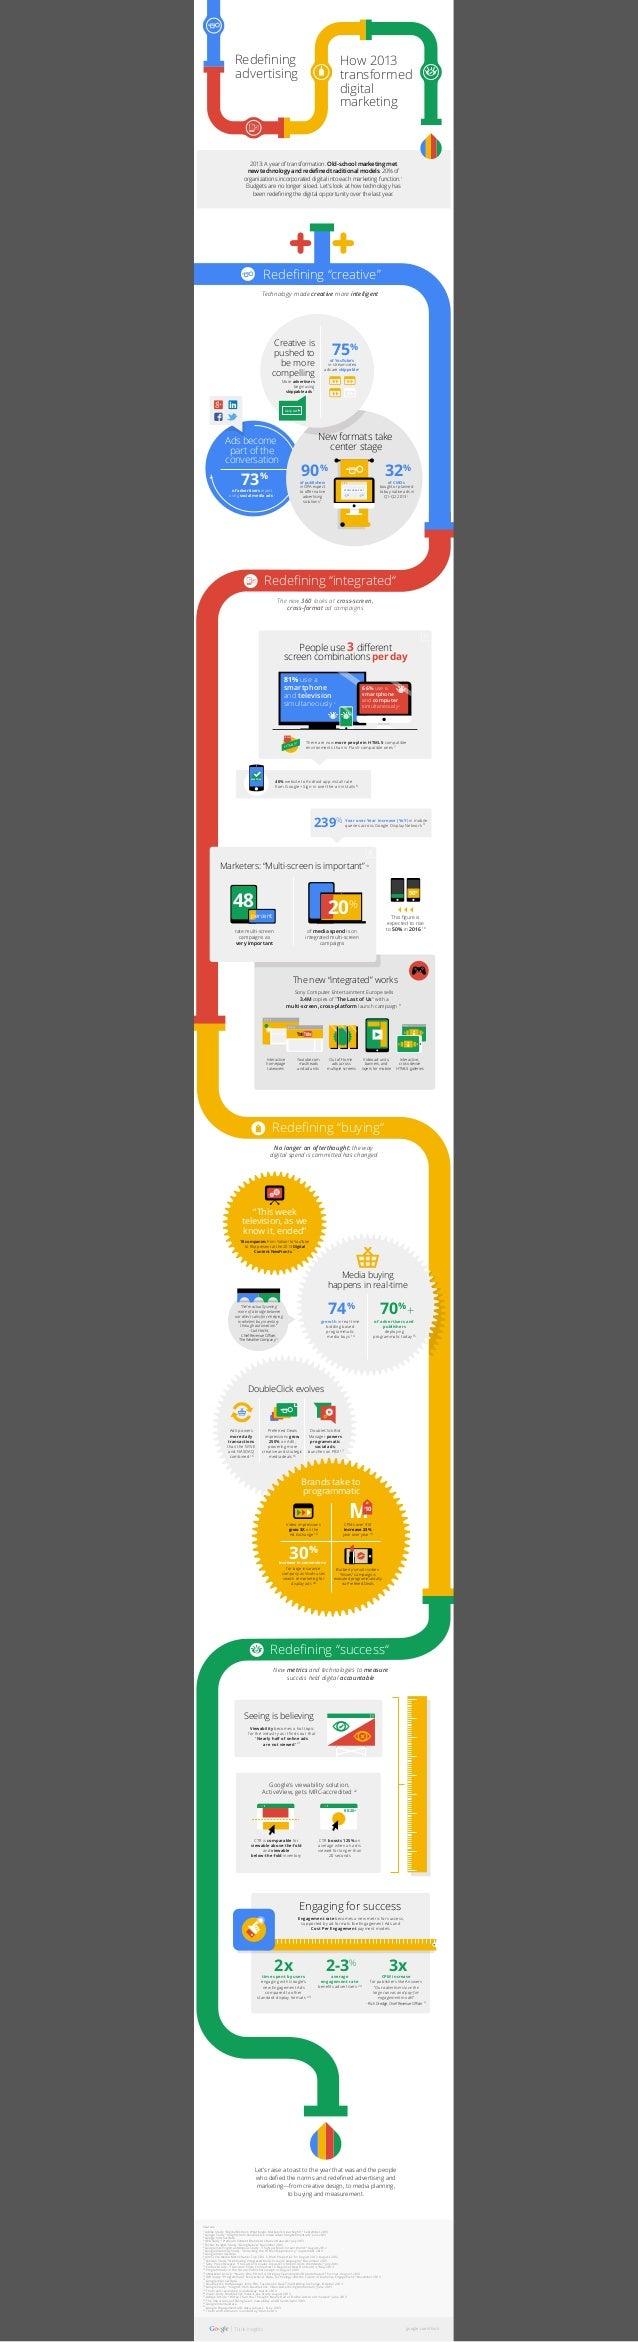 Redefining advertising  How 2013 transformed digital marketing  2013: A year of transformation. Old-school marketing met ne...